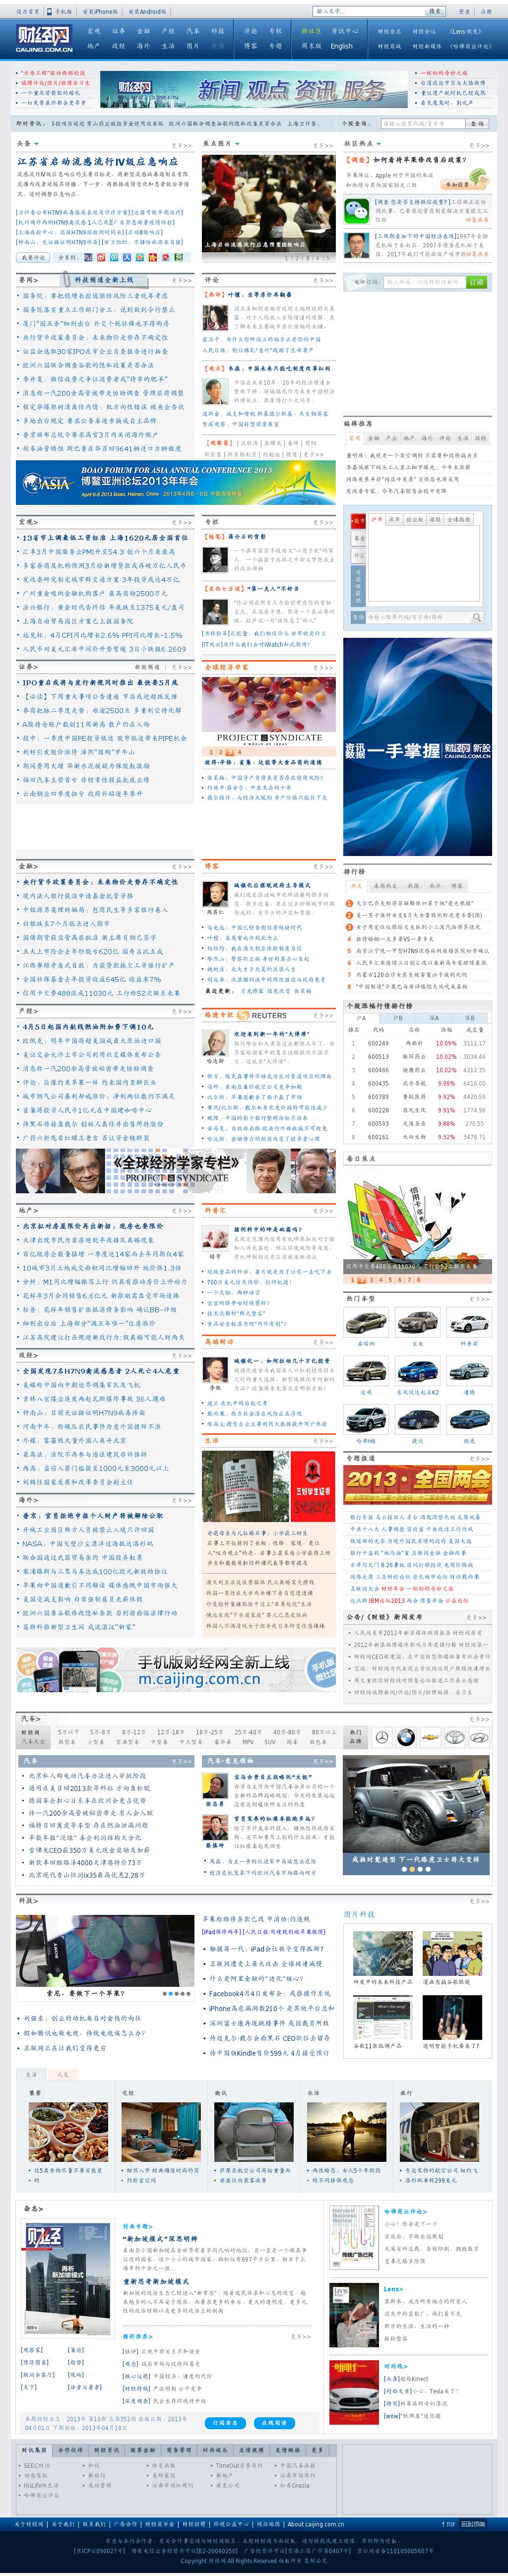 Caijing at Wednesday April 3, 2013, 2:02 p.m. UTC